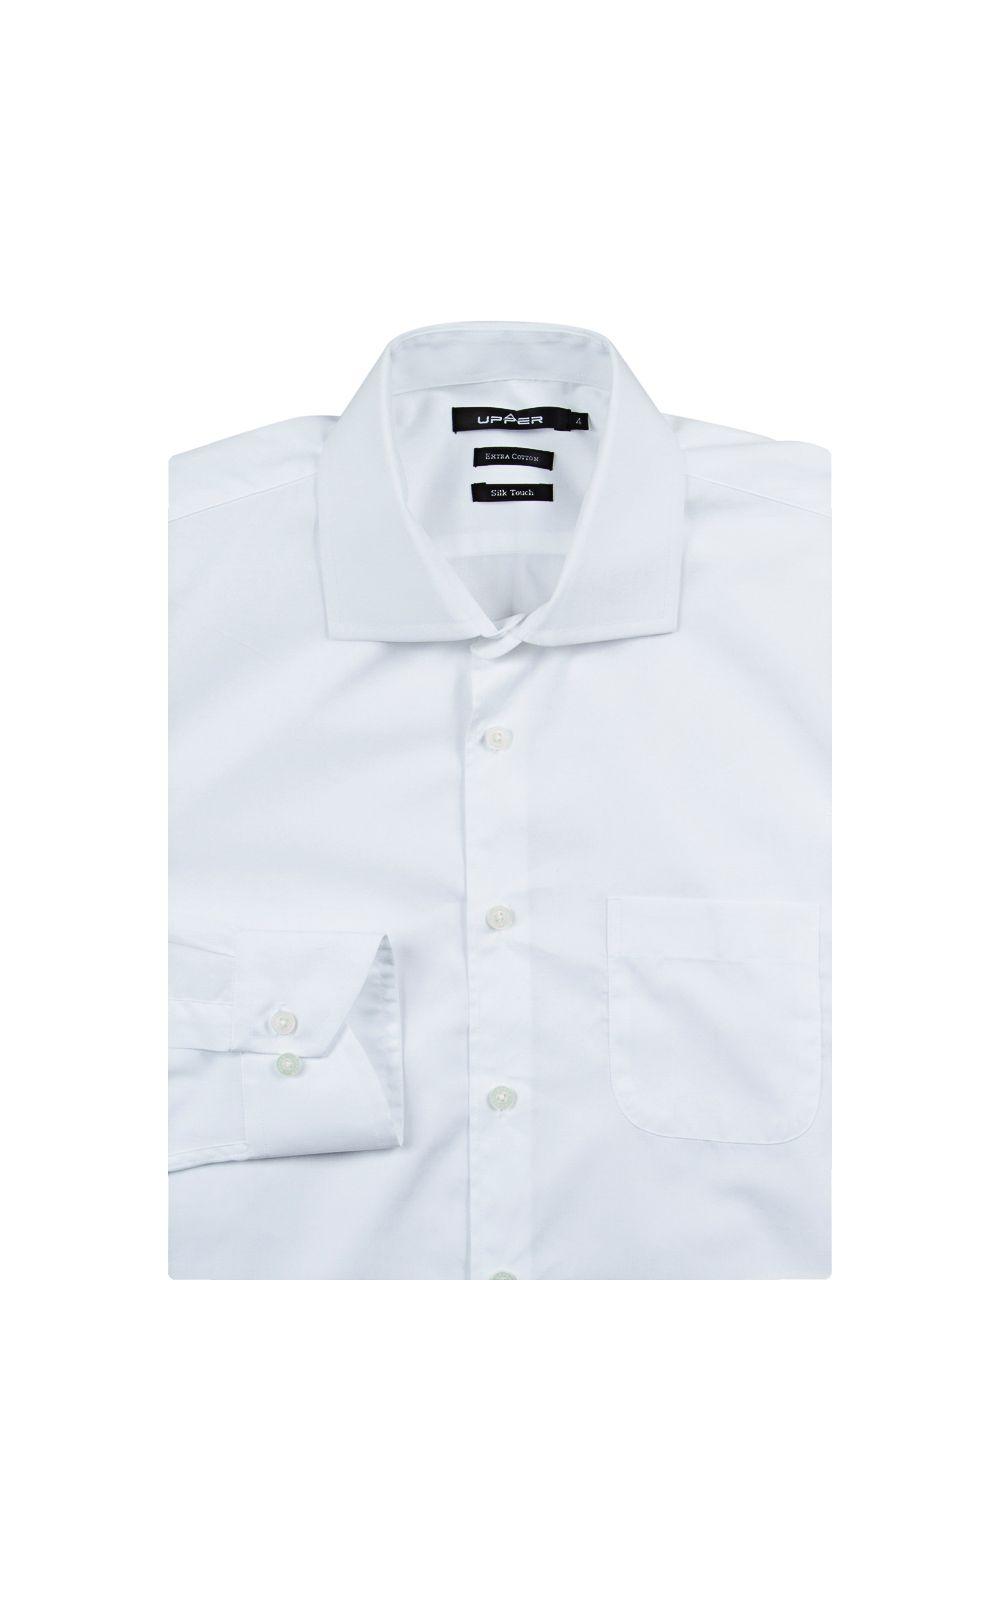 Foto 4 - Camisa Social Masculina Branca Lisa